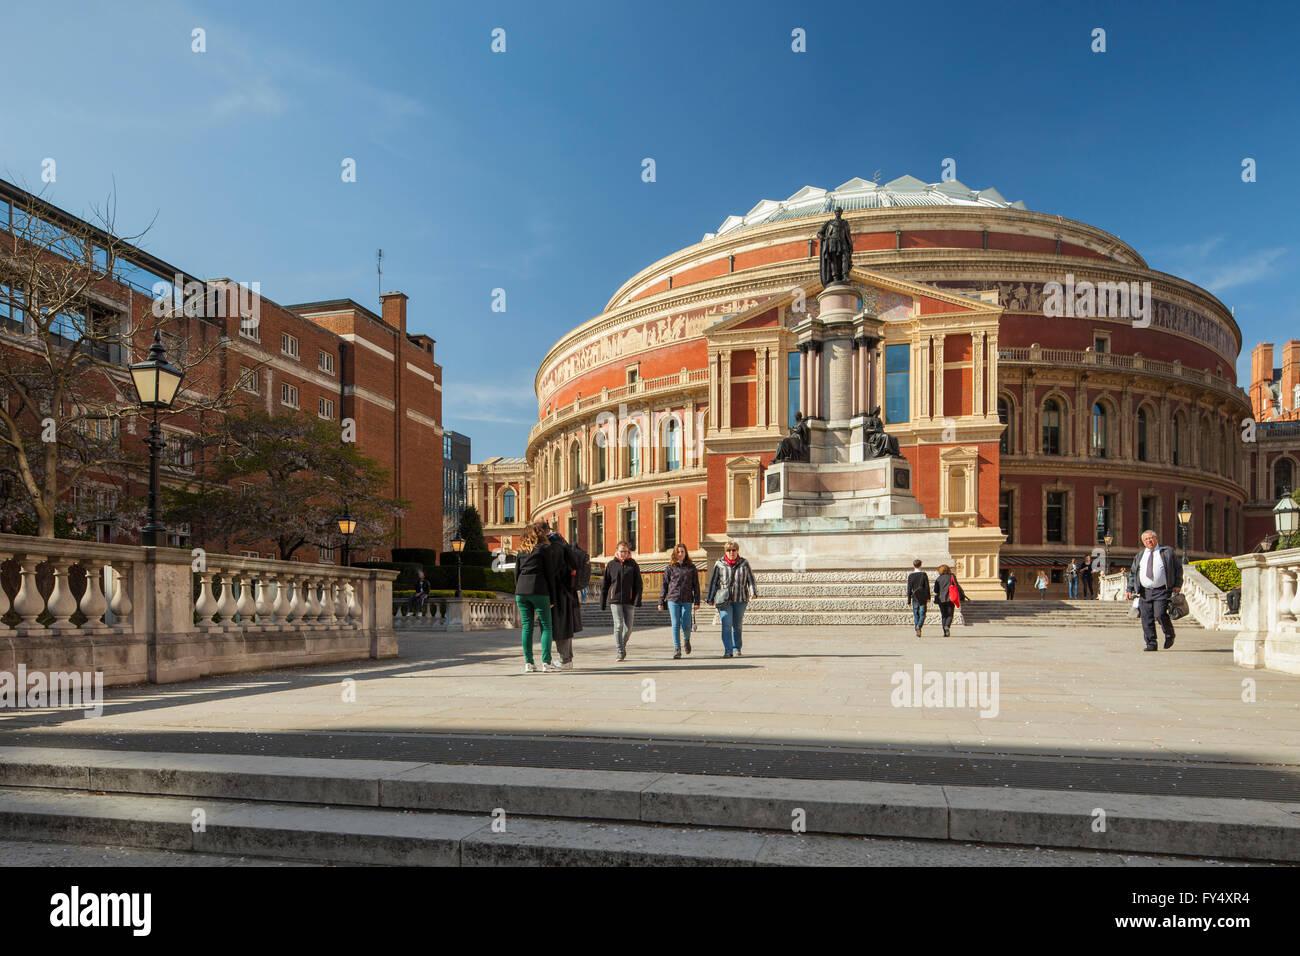 Albert Hall in Kensington, London, England. - Stock Image